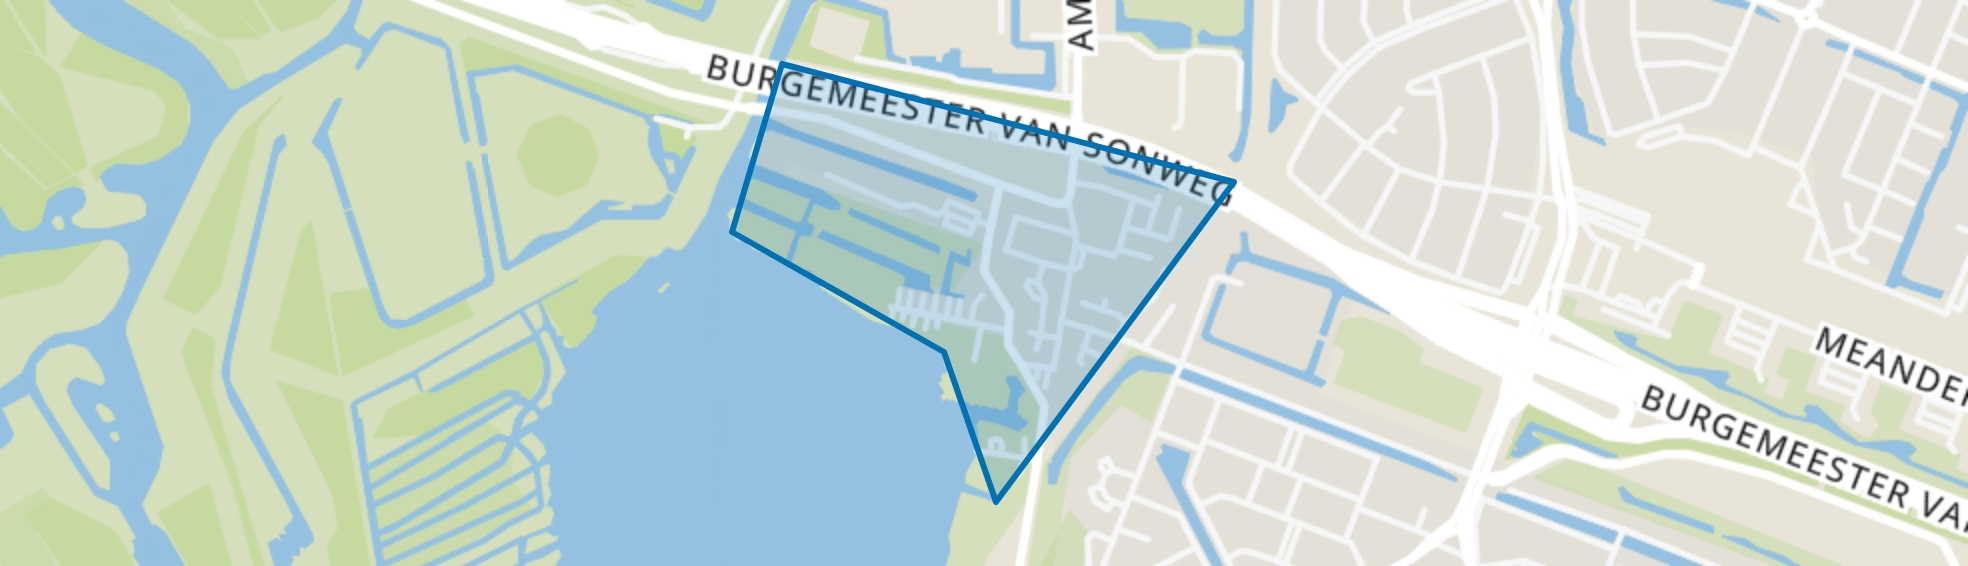 Oude Dorp, Amstelveen map